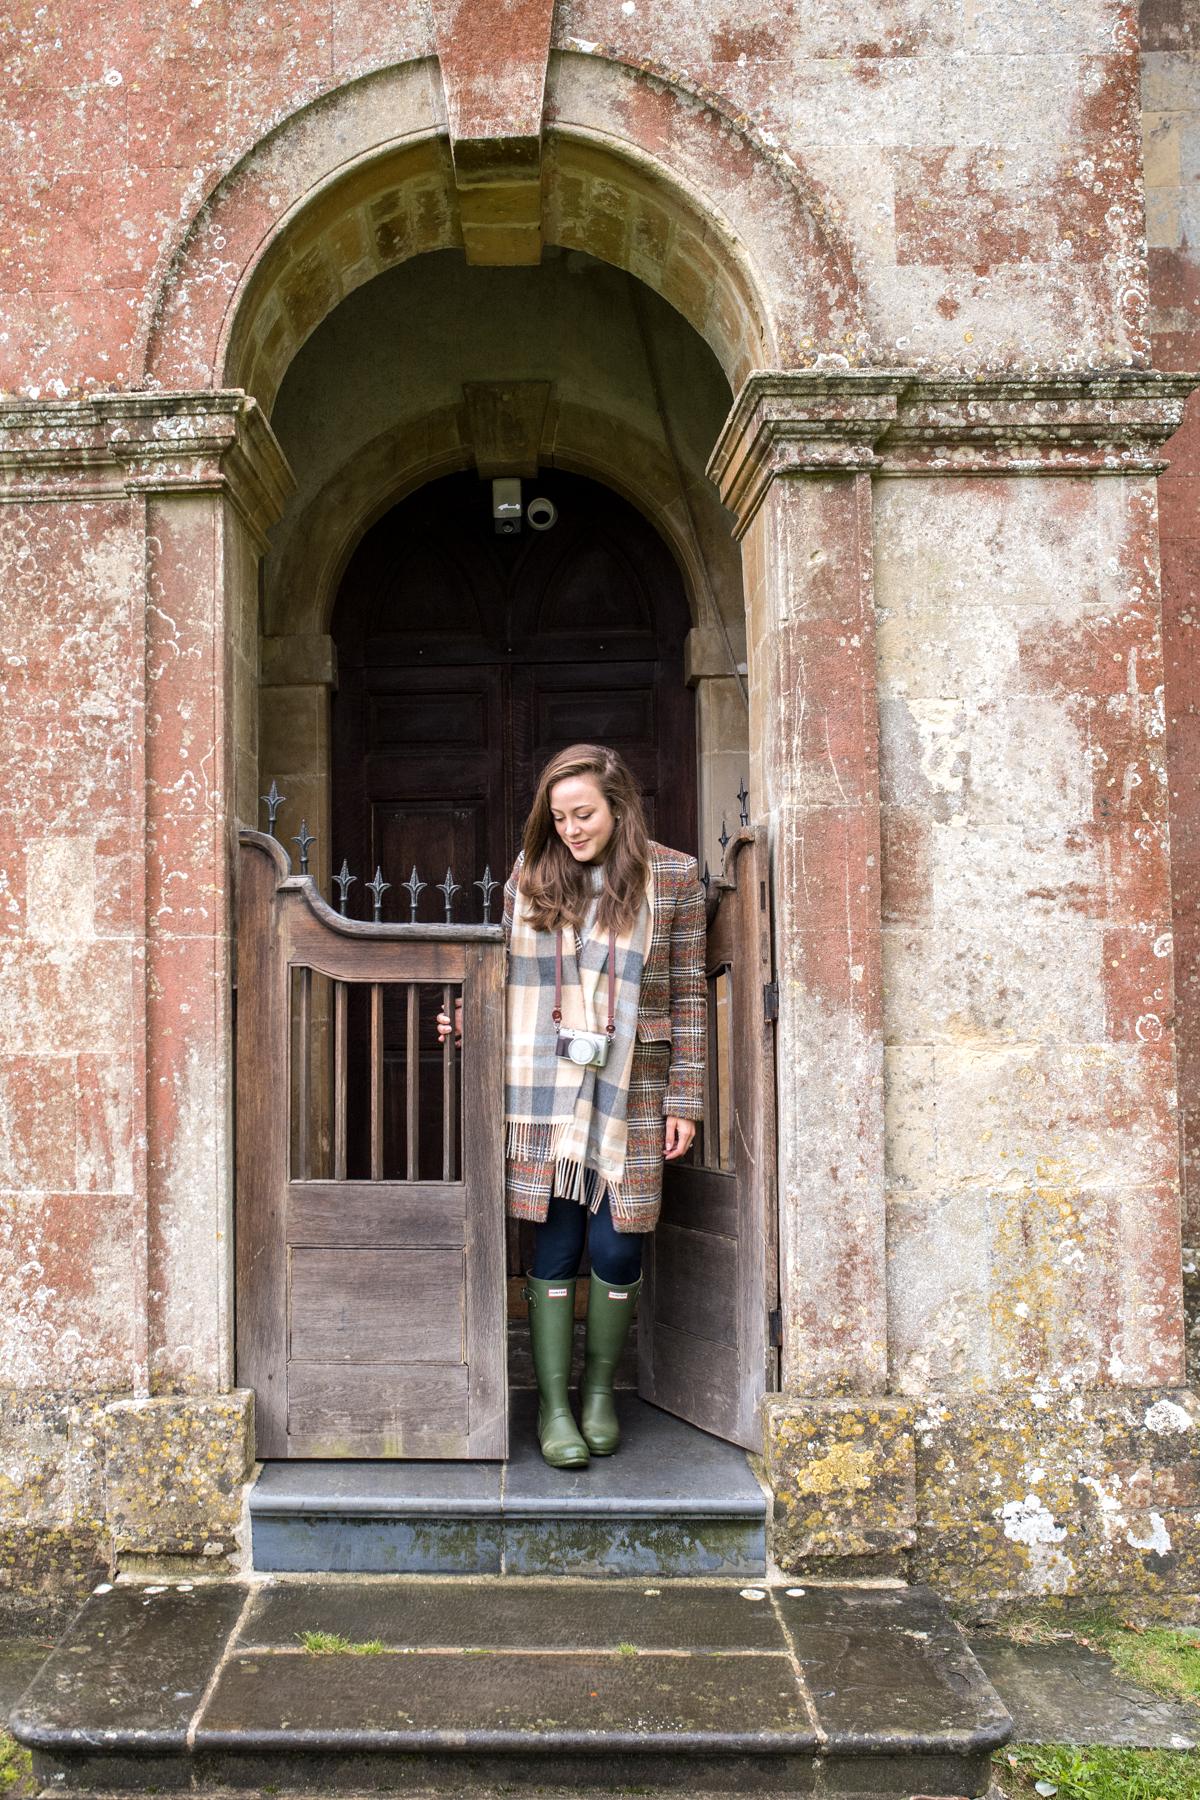 Stacie Flinner Soho House Babington House England-49.jpg